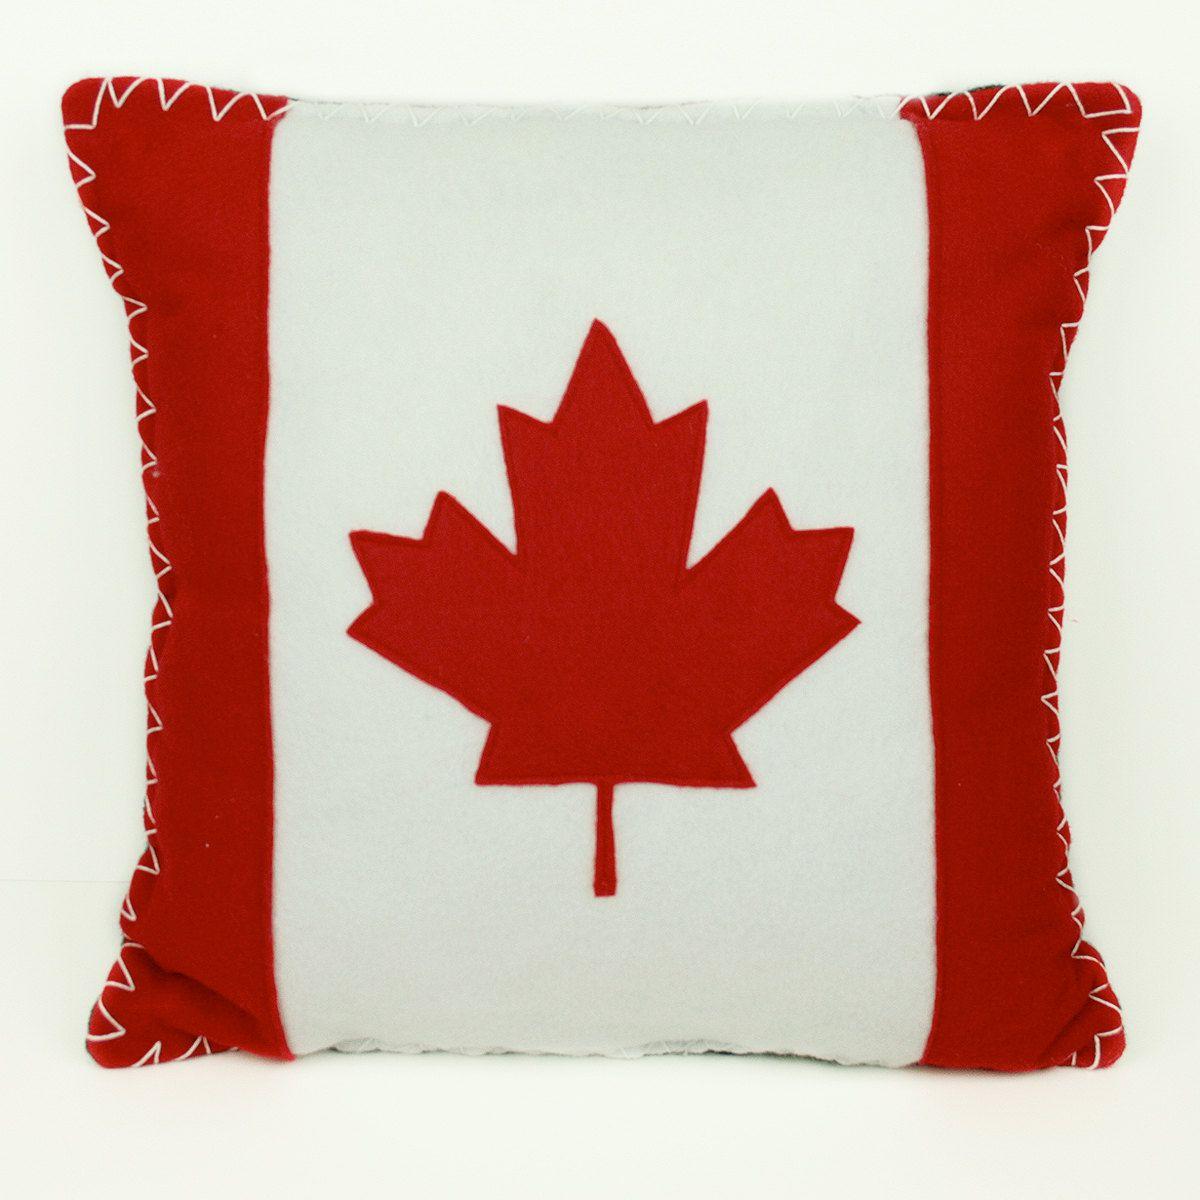 Canadian Inspired Home Decor Canada Pillow Via Etsy: Happy Canada Day Everyone!!!!